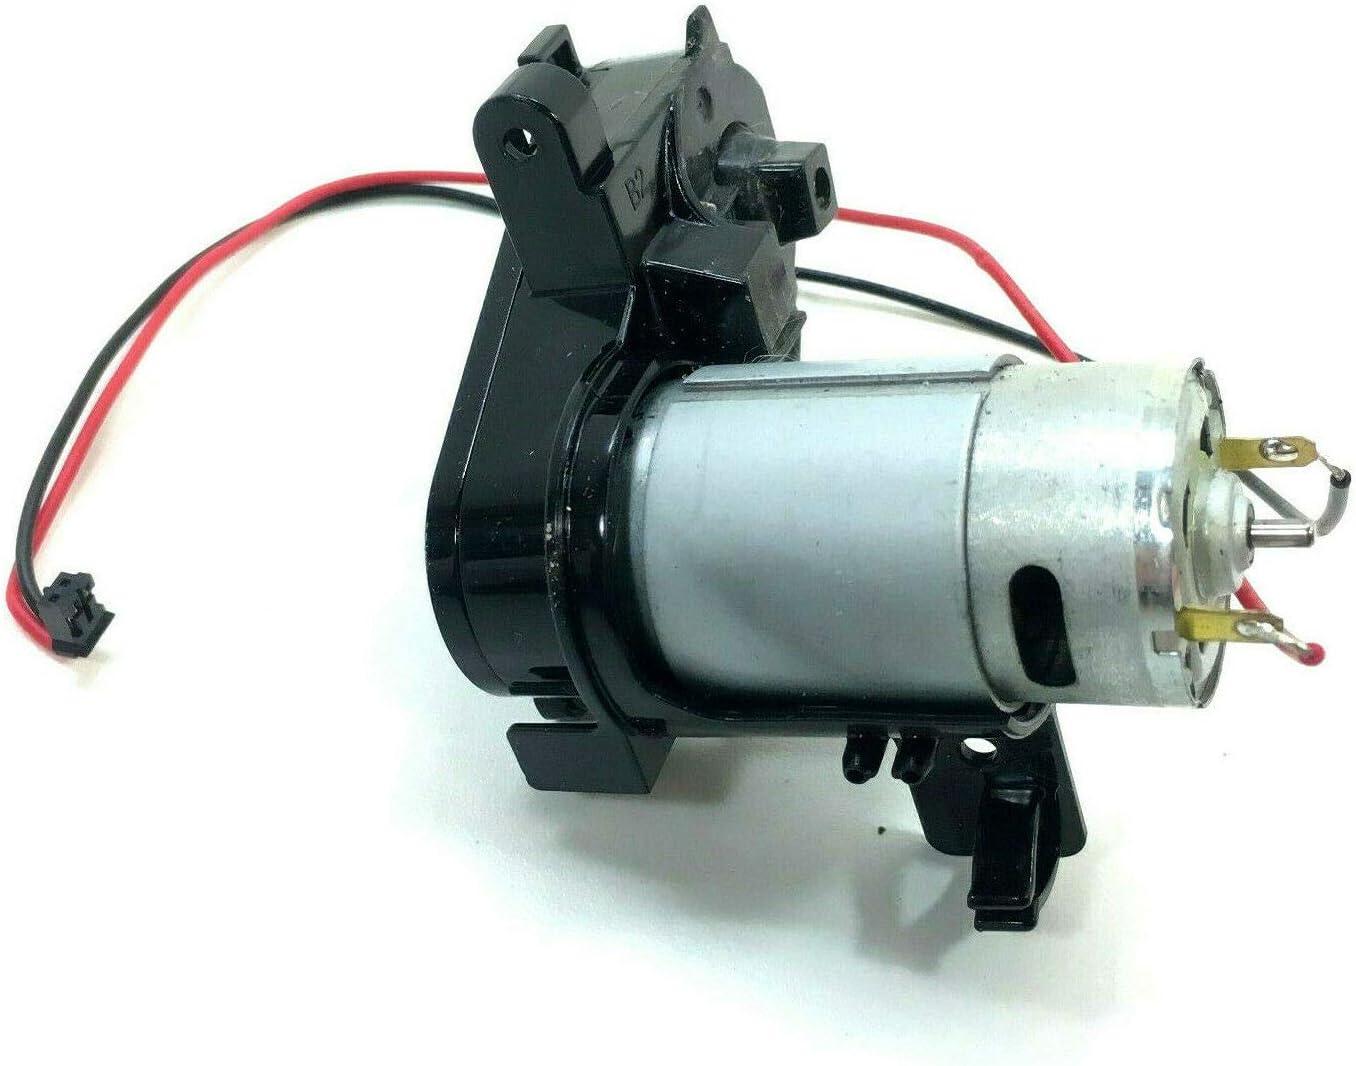 Shark Ion Robot Vacuum Brush Motor Replacement - RV750N, RV700N,